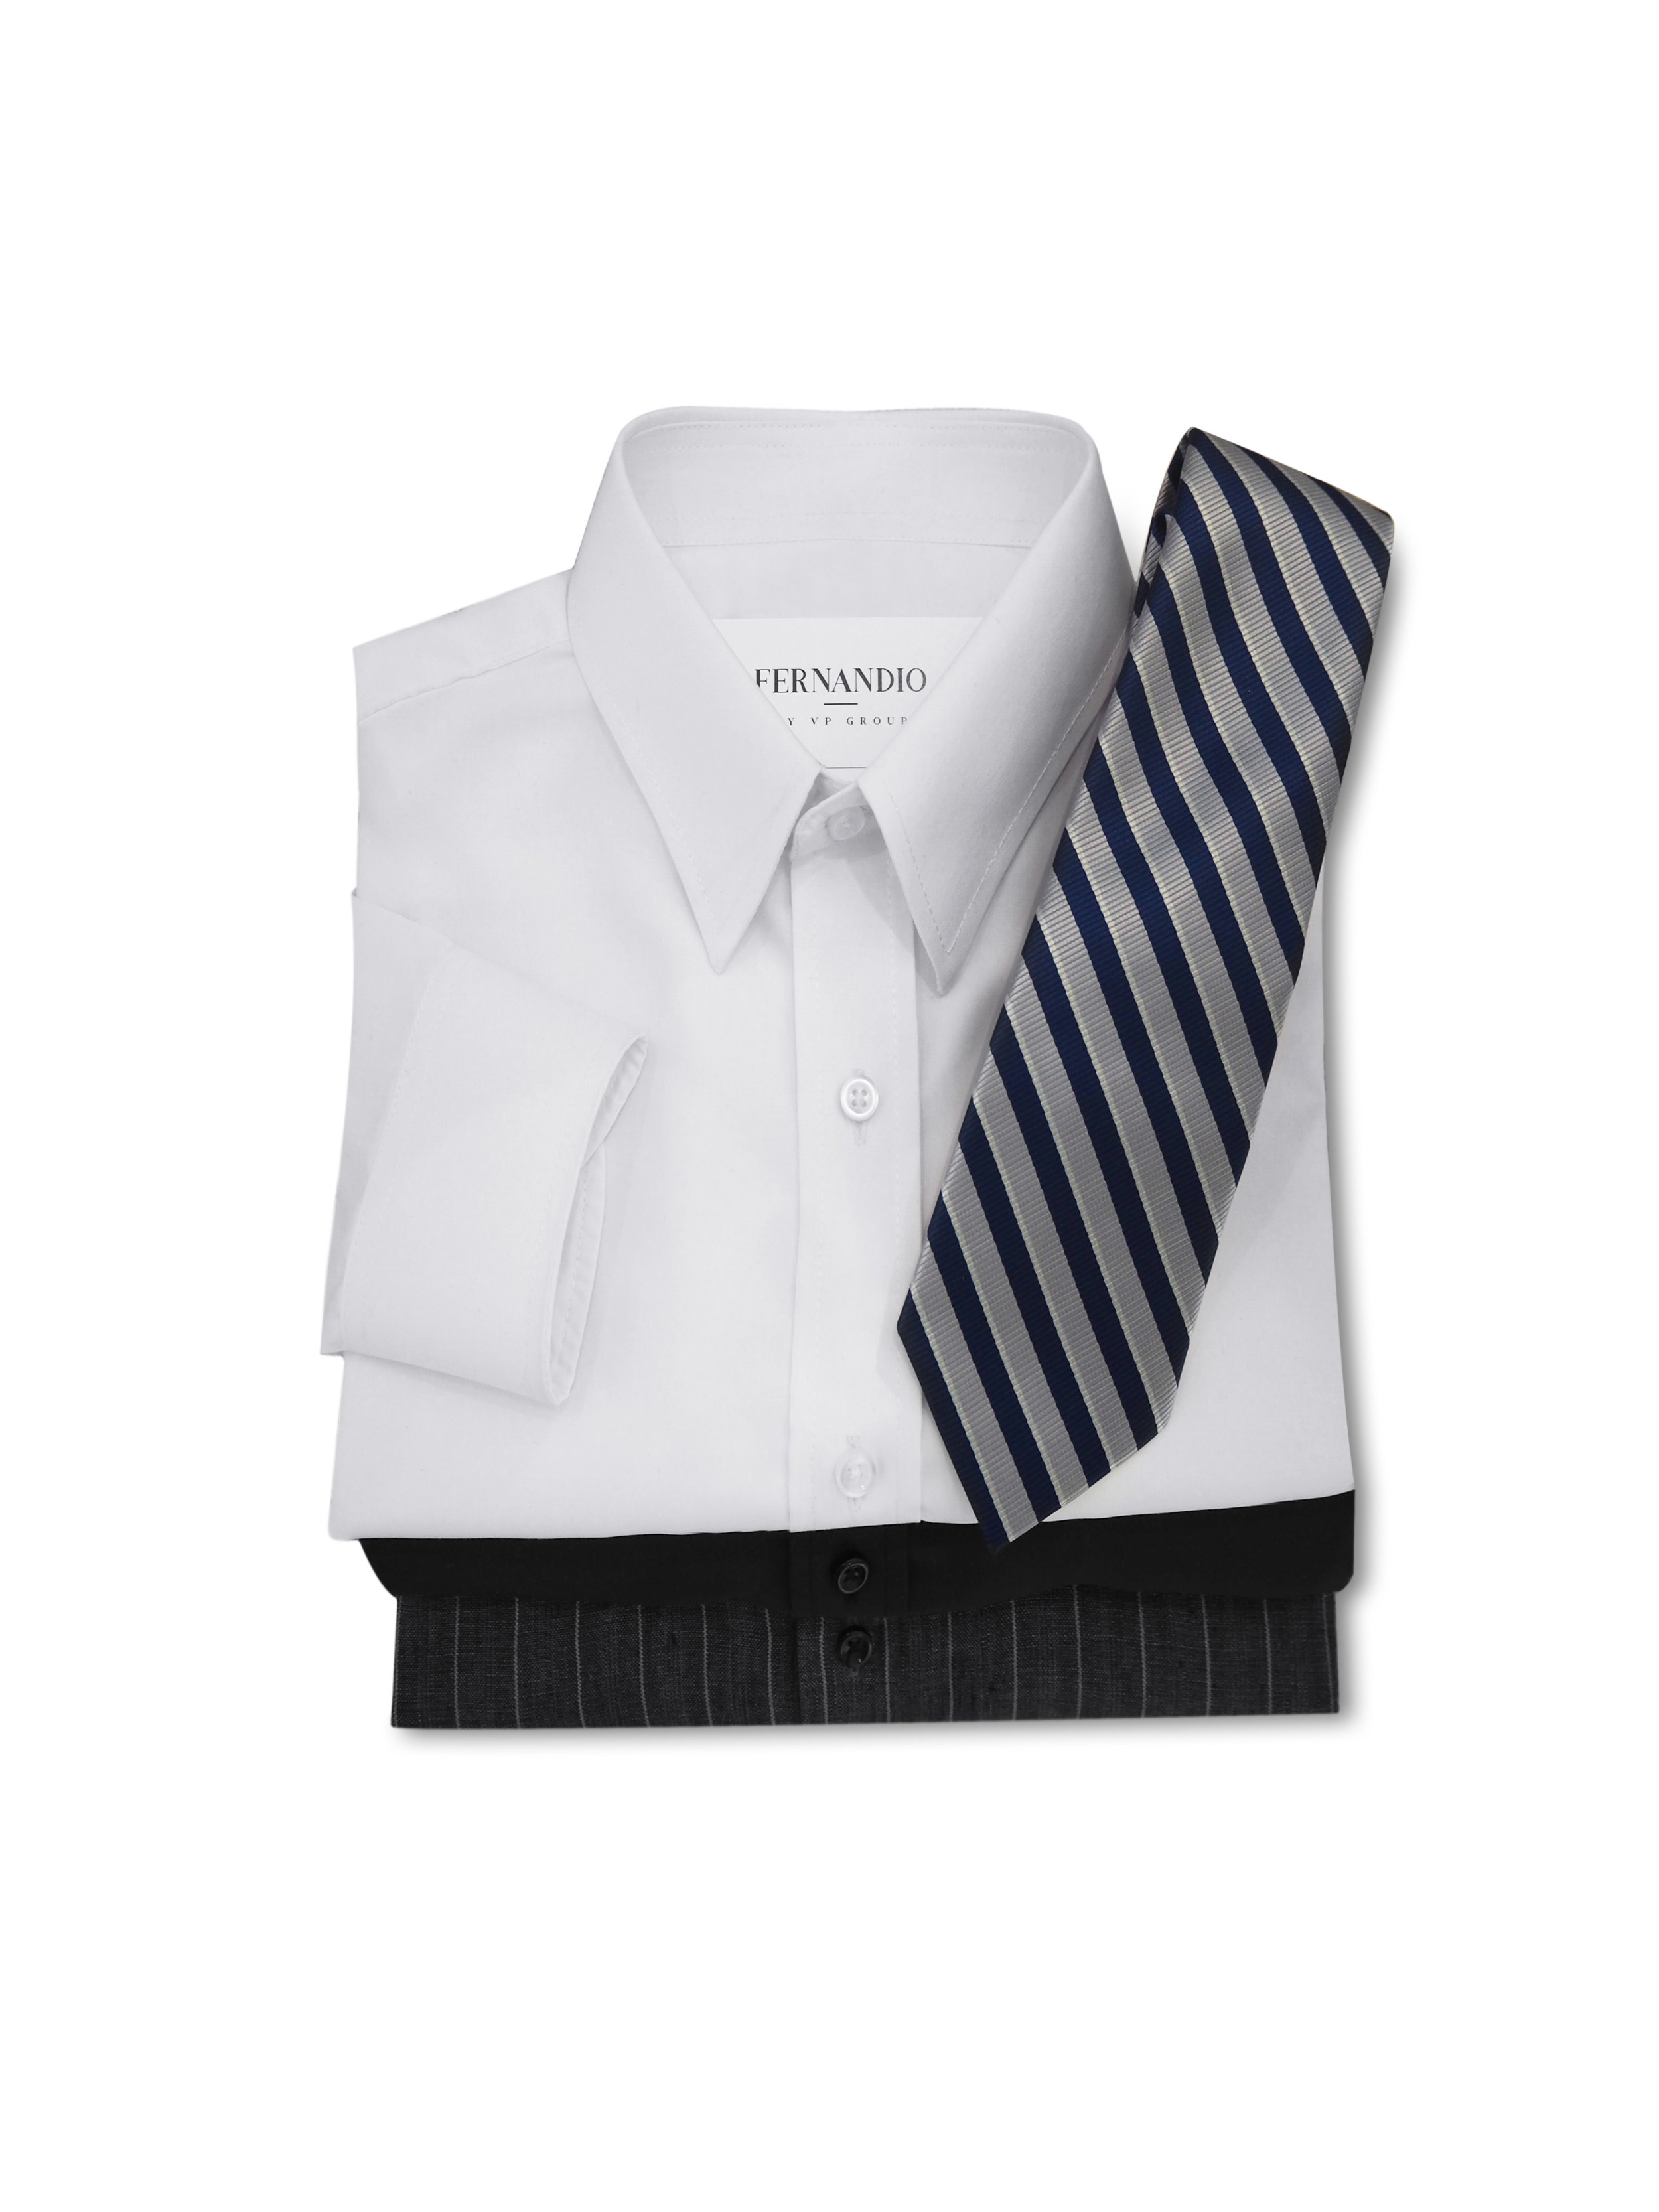 BESPOKE SHIRT - สั่งตัดเสื้อเชิ้ตแบบ Perfect fit ที่คุณใส่แล้วดูดีที่สุดราคาเริ่มต้นเพียง THB 1,500